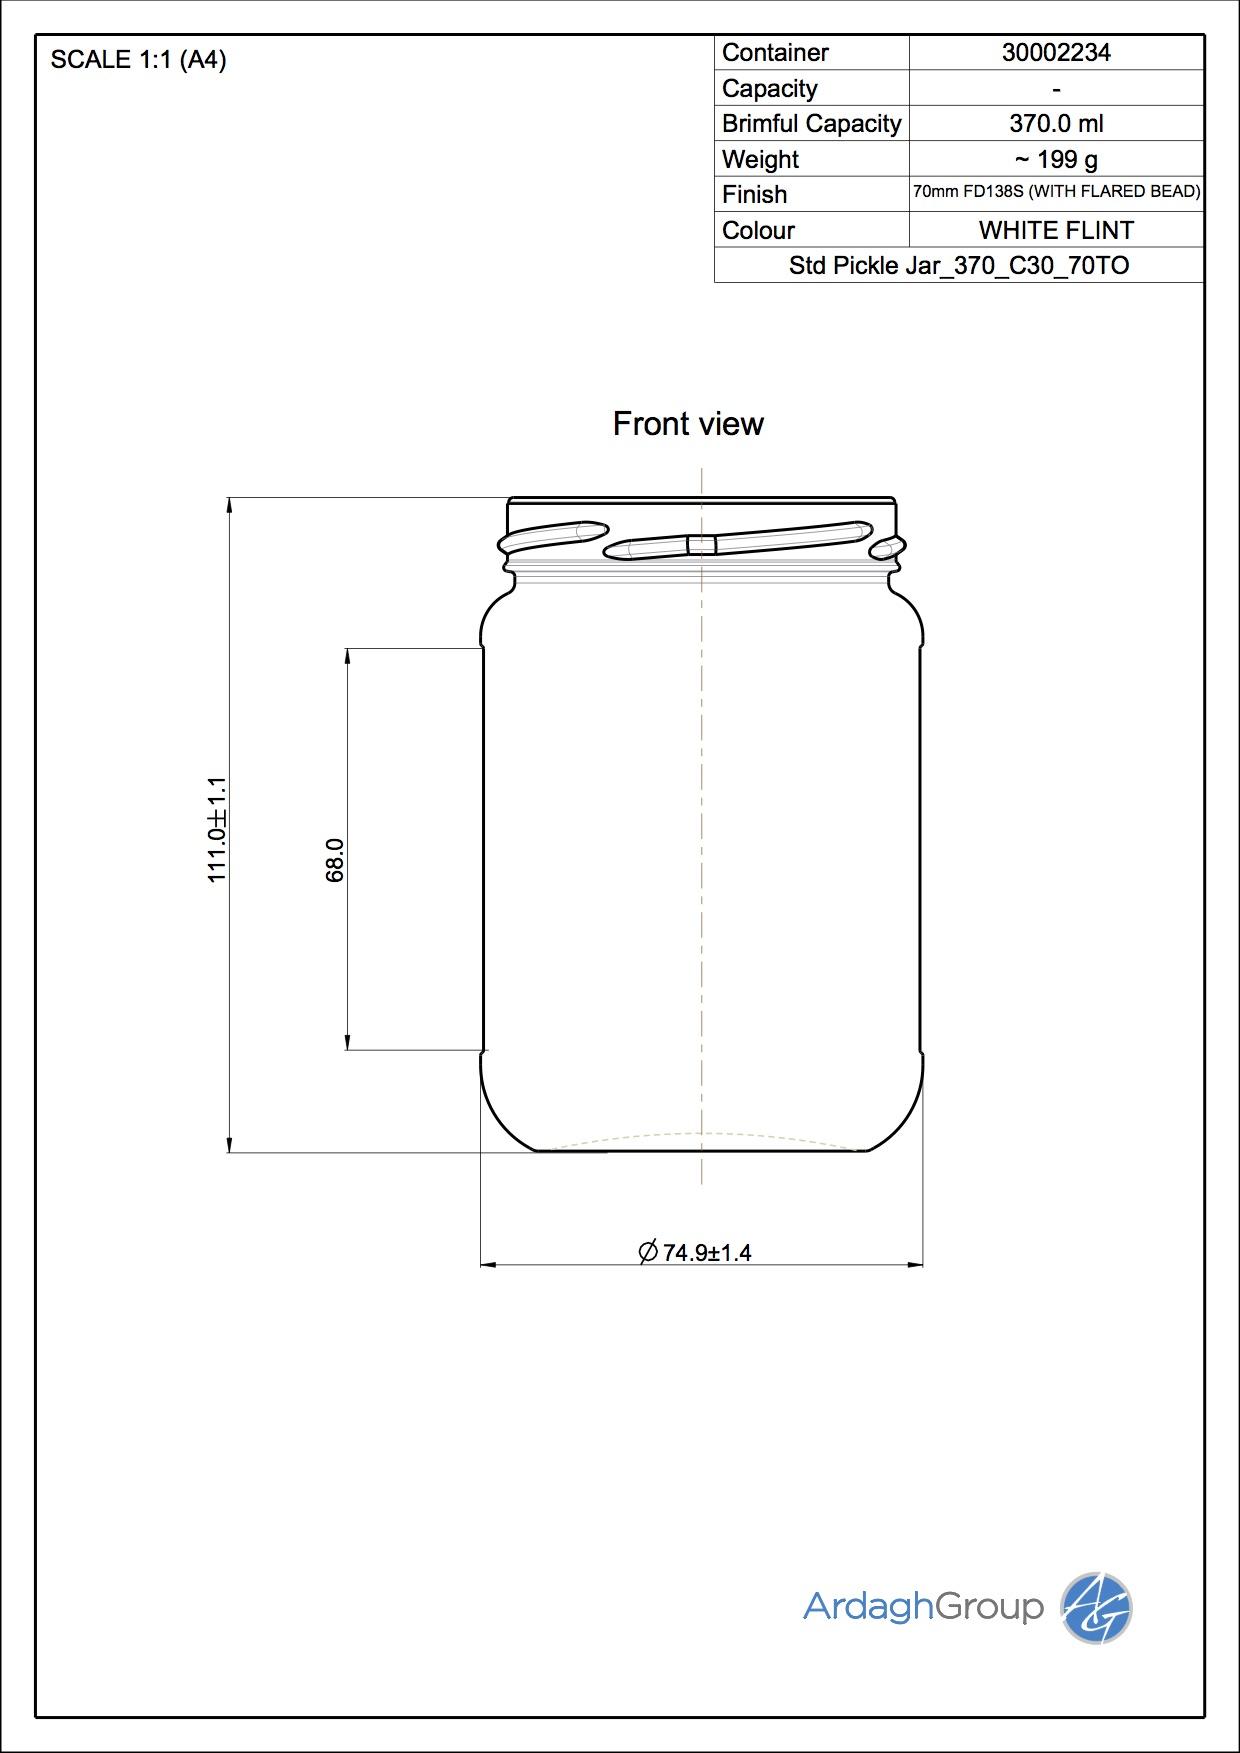 Std Pickle Jar_370_C30_70TO